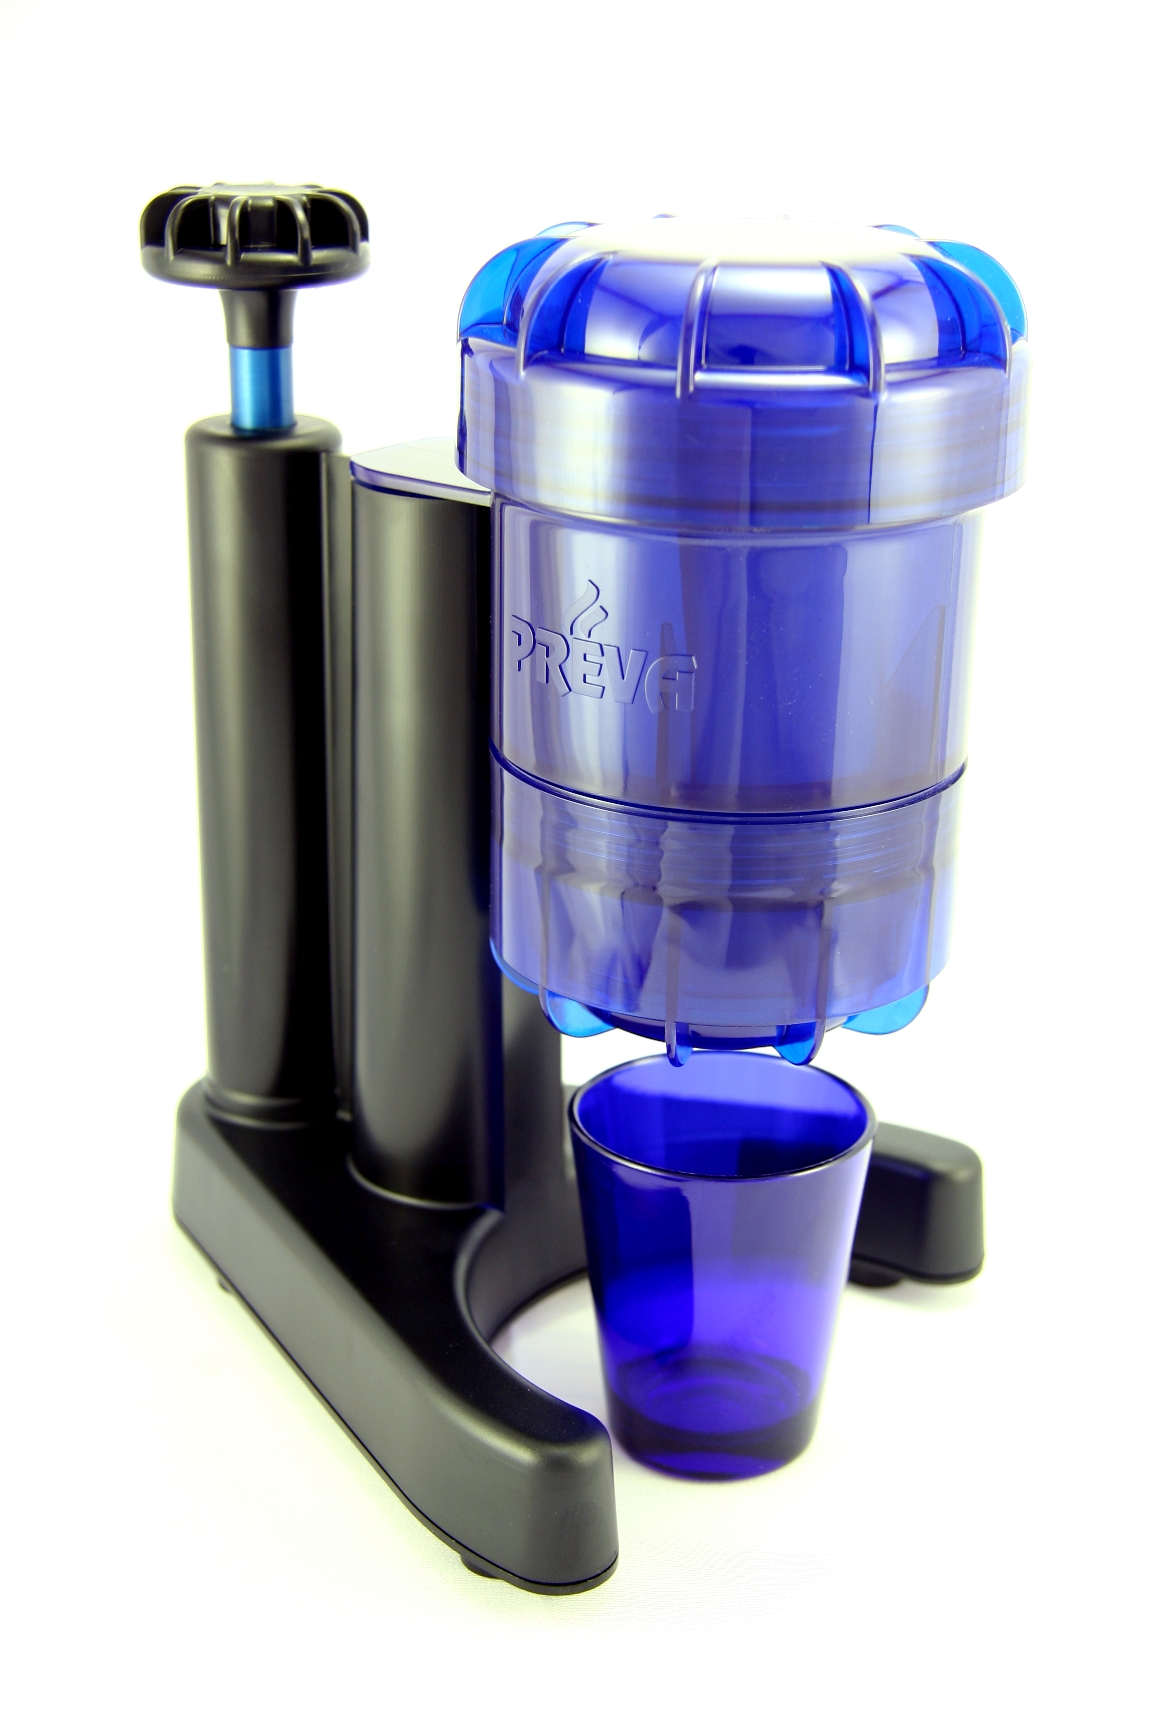 Portable Coffee Maker Rei : Preva xSport Portable Espresso Maker By Preva Cafe, LLC, USA